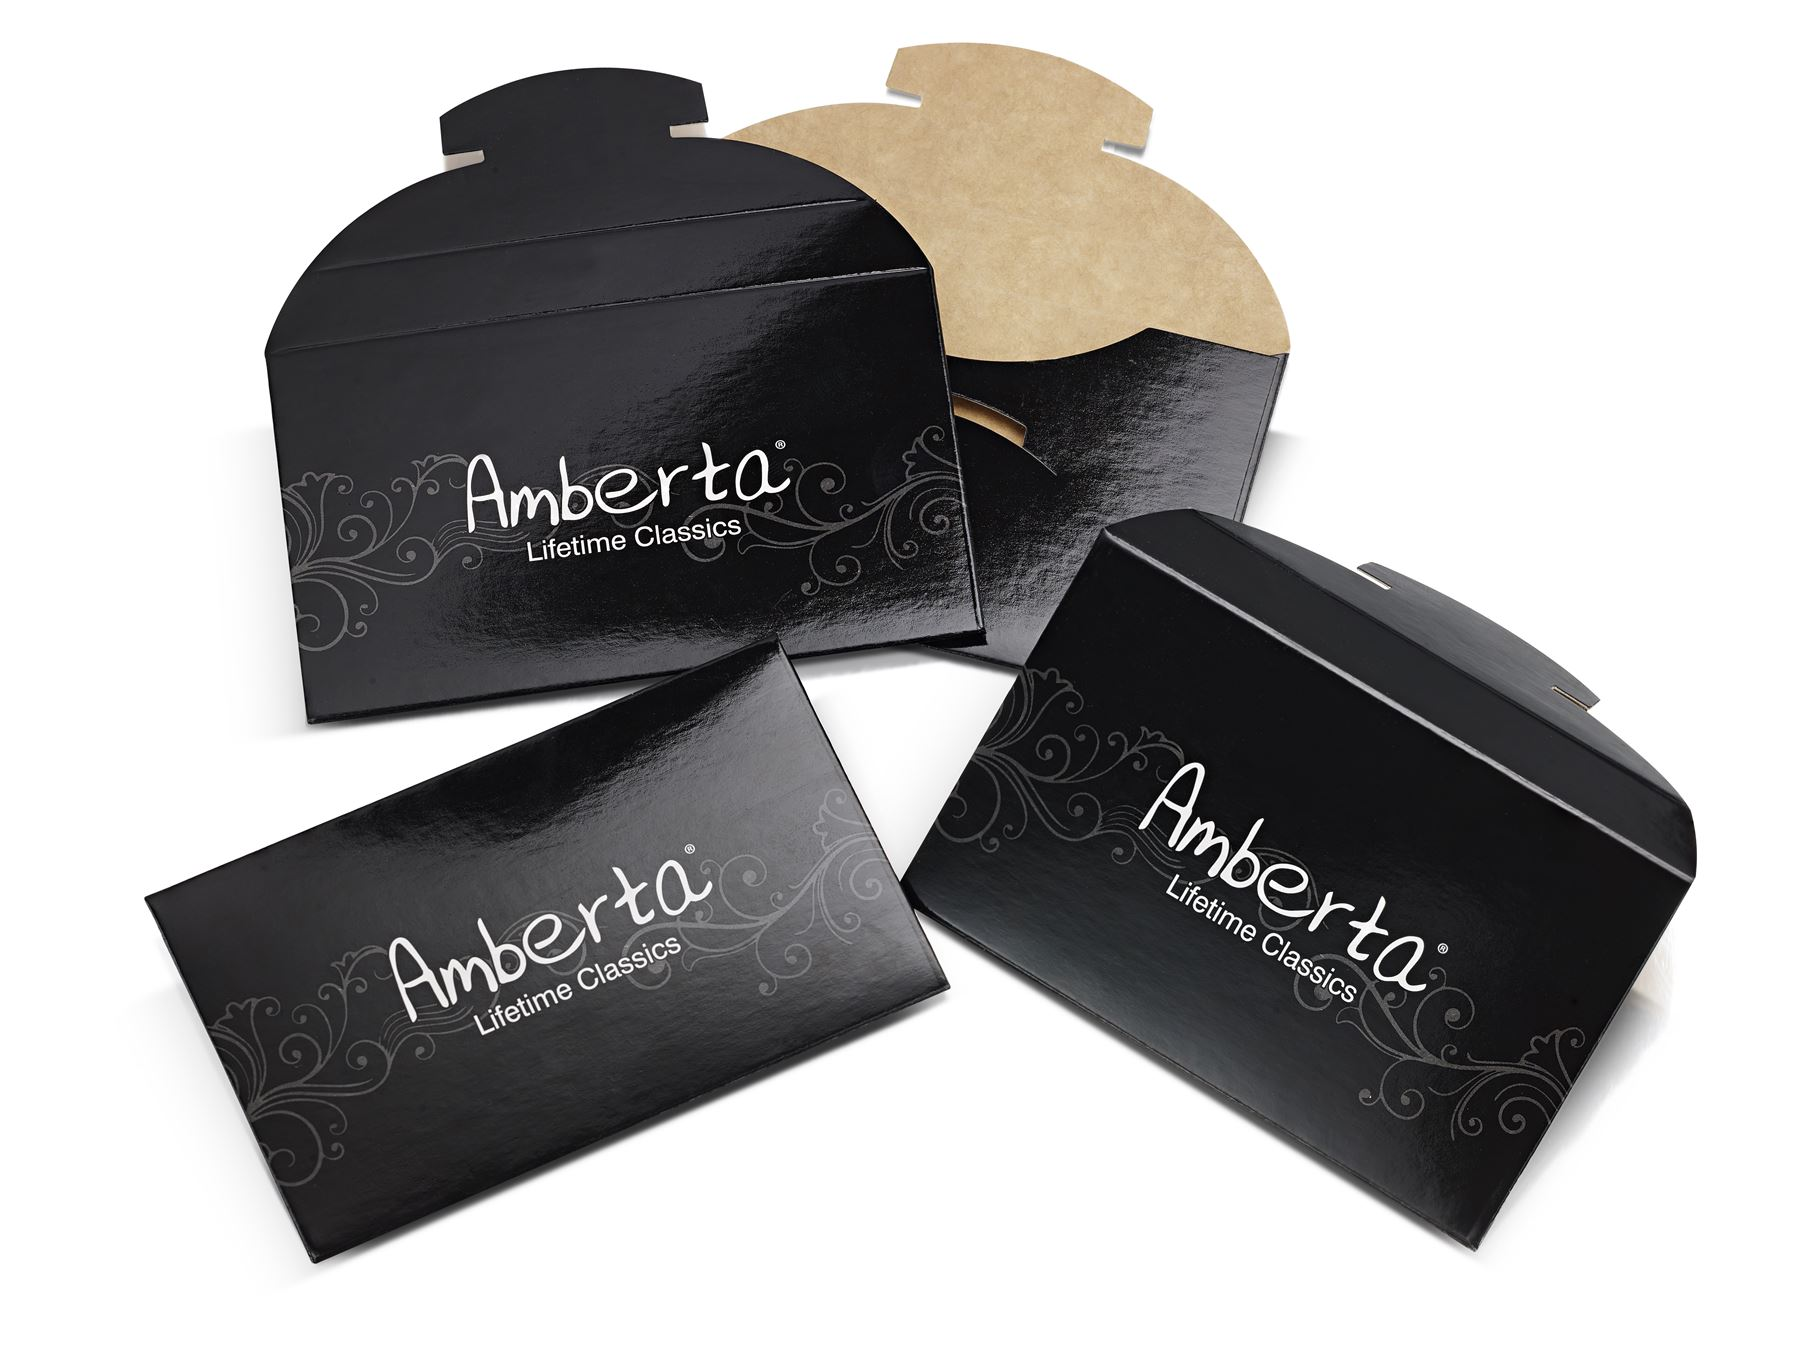 Amberta-Jewelry-925-Sterling-Silver-Adjustable-Bracelet-Italian-Bangle-for-Women thumbnail 40